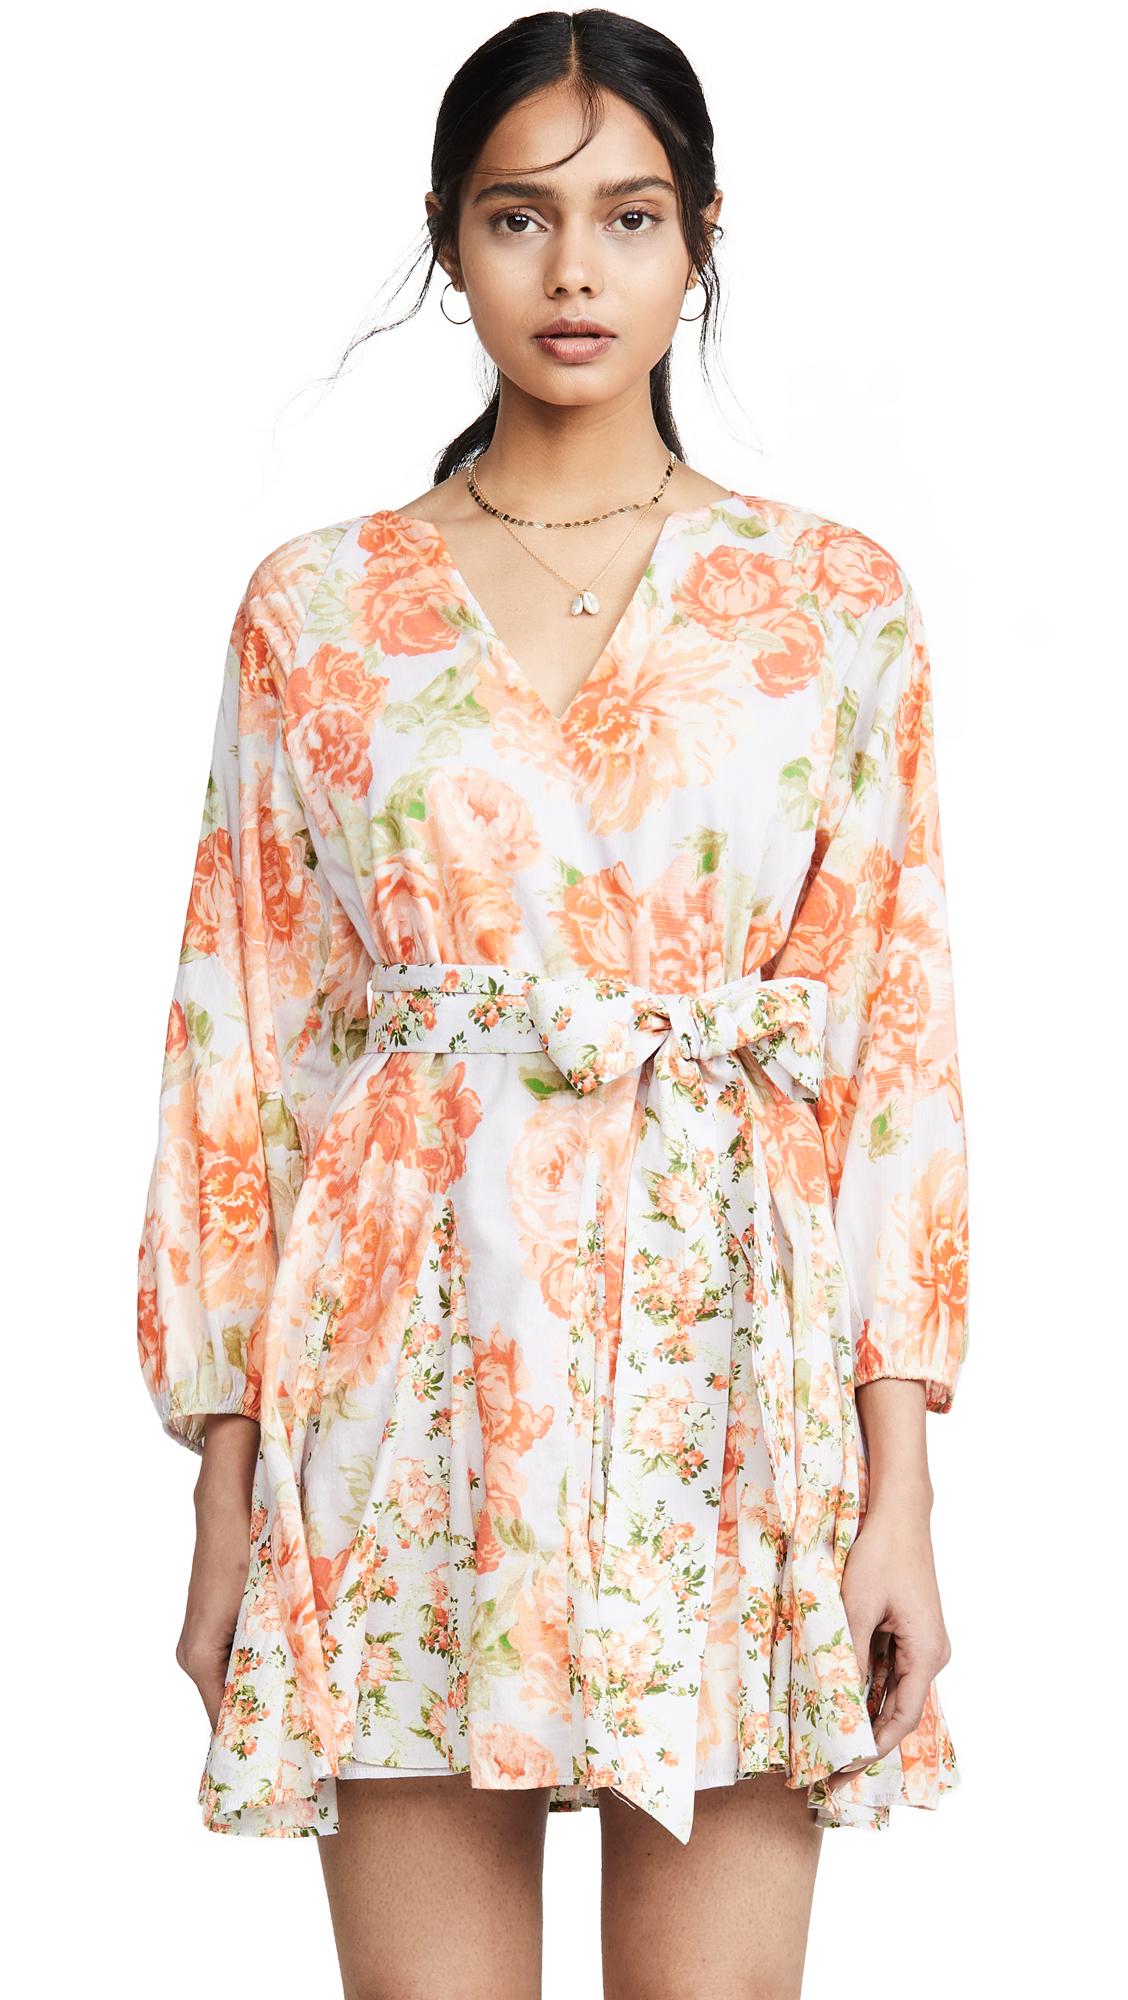 alice + olivia Pali Keyhole Godet Dress - Posy Garden Dusty Orchid/Multi